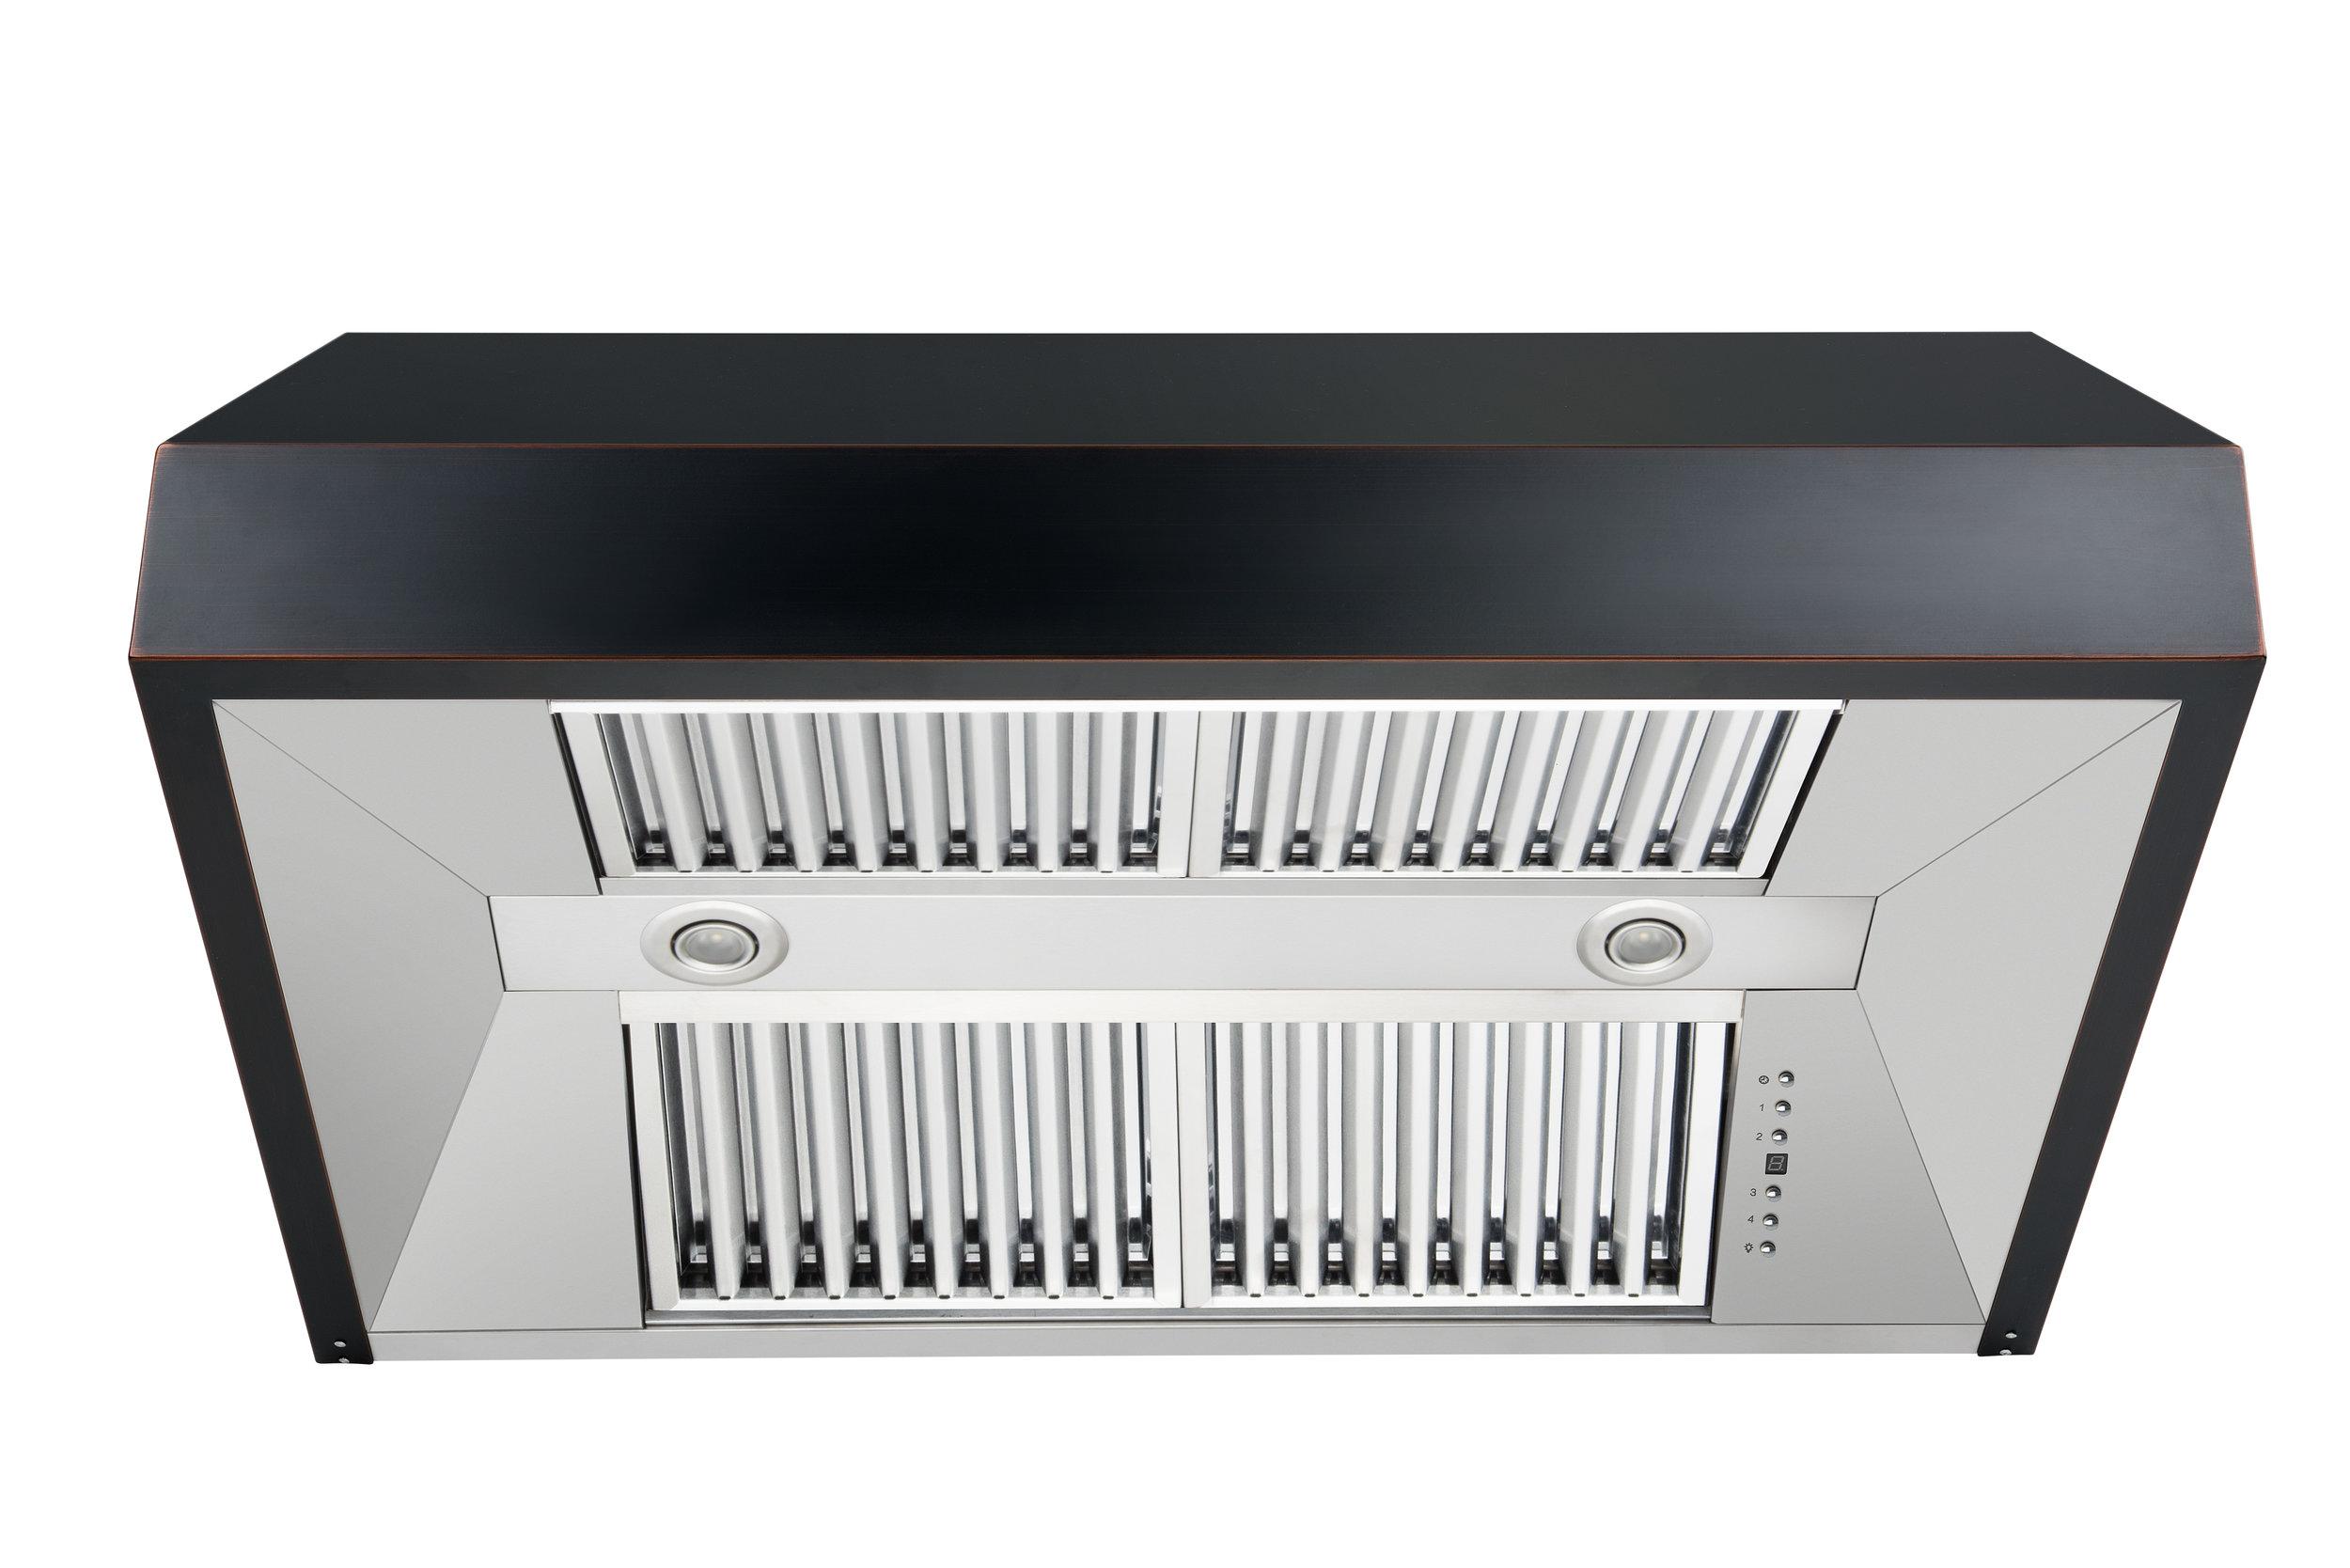 zline-black-under-cabinet-range-hood-8685B-vents.jpg